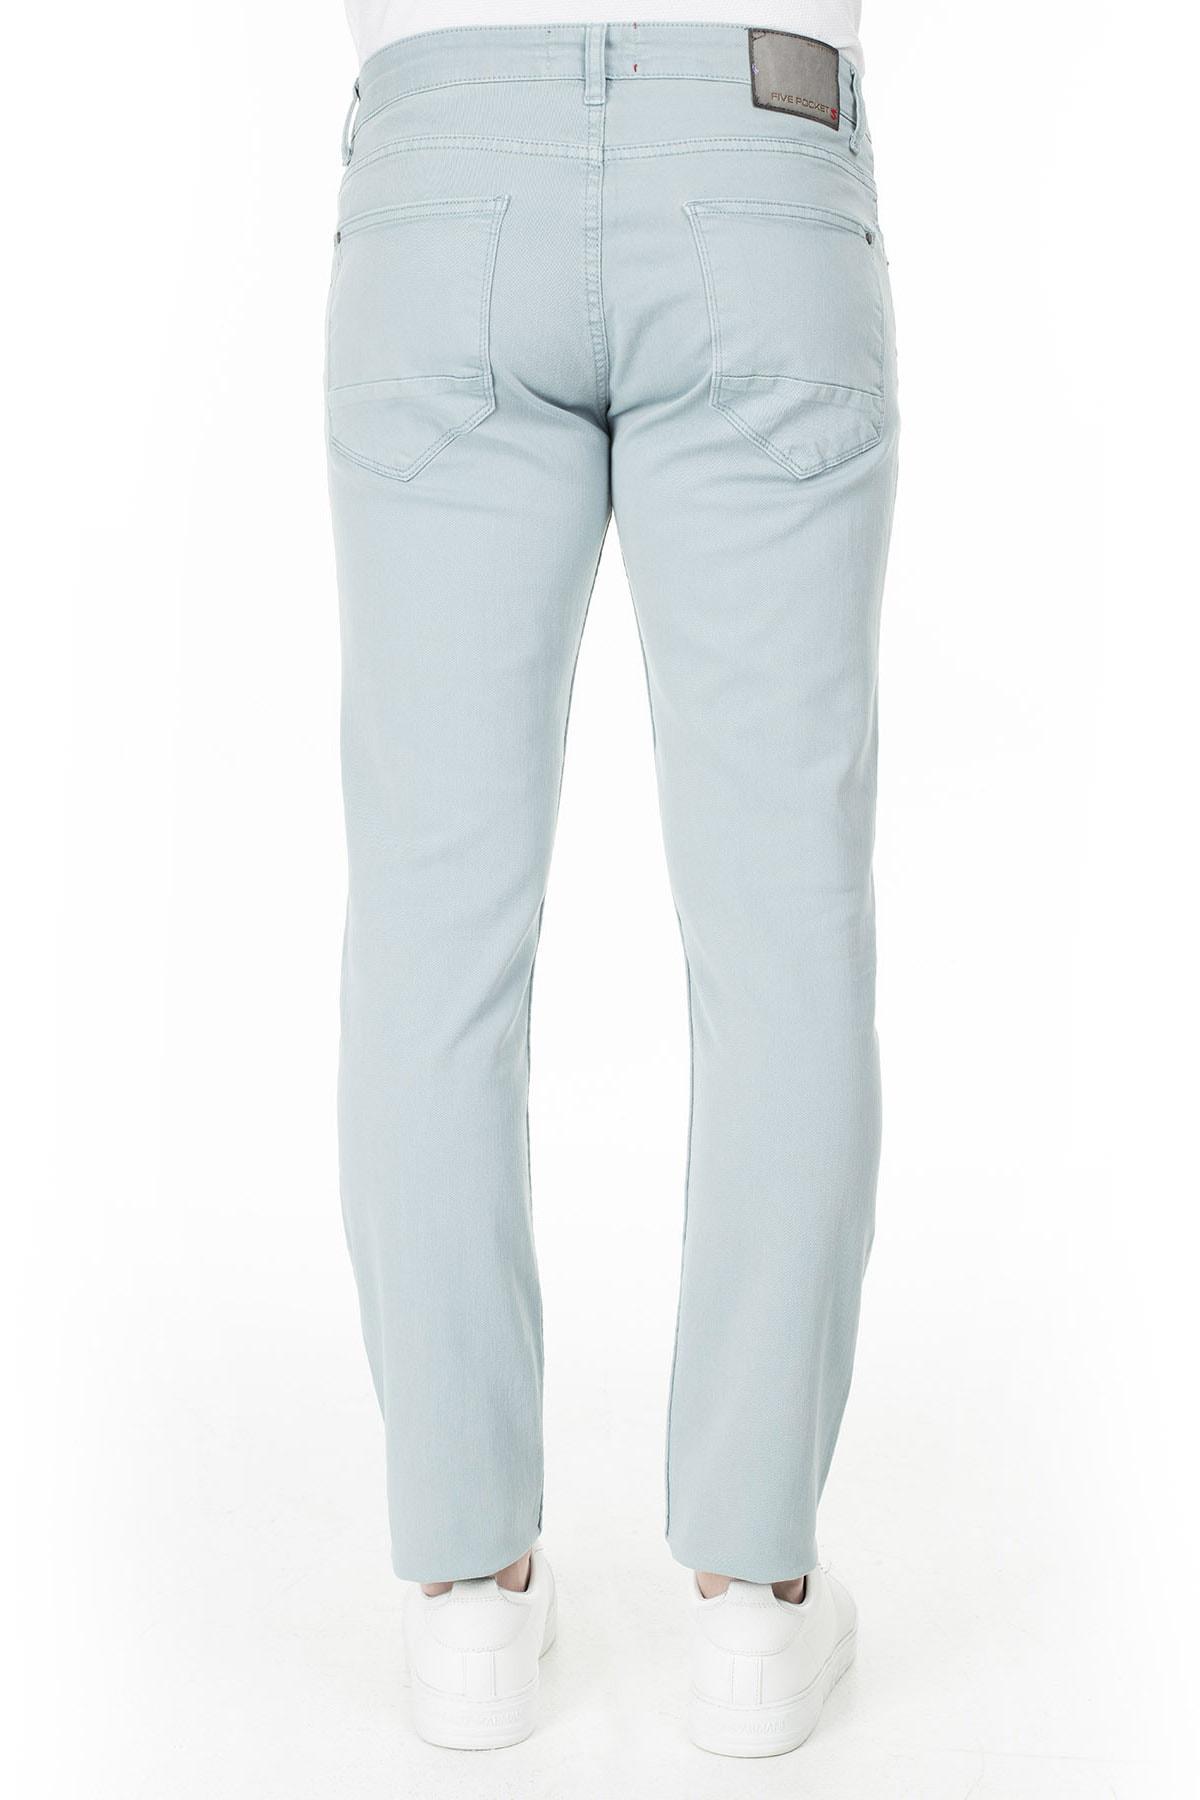 Buratti Erkek AÇIK MAVİ Normal Bel Dar Paça Slim Fit Jeans Pamuklu Kot Pantolon 7299F0287ARTOS 3